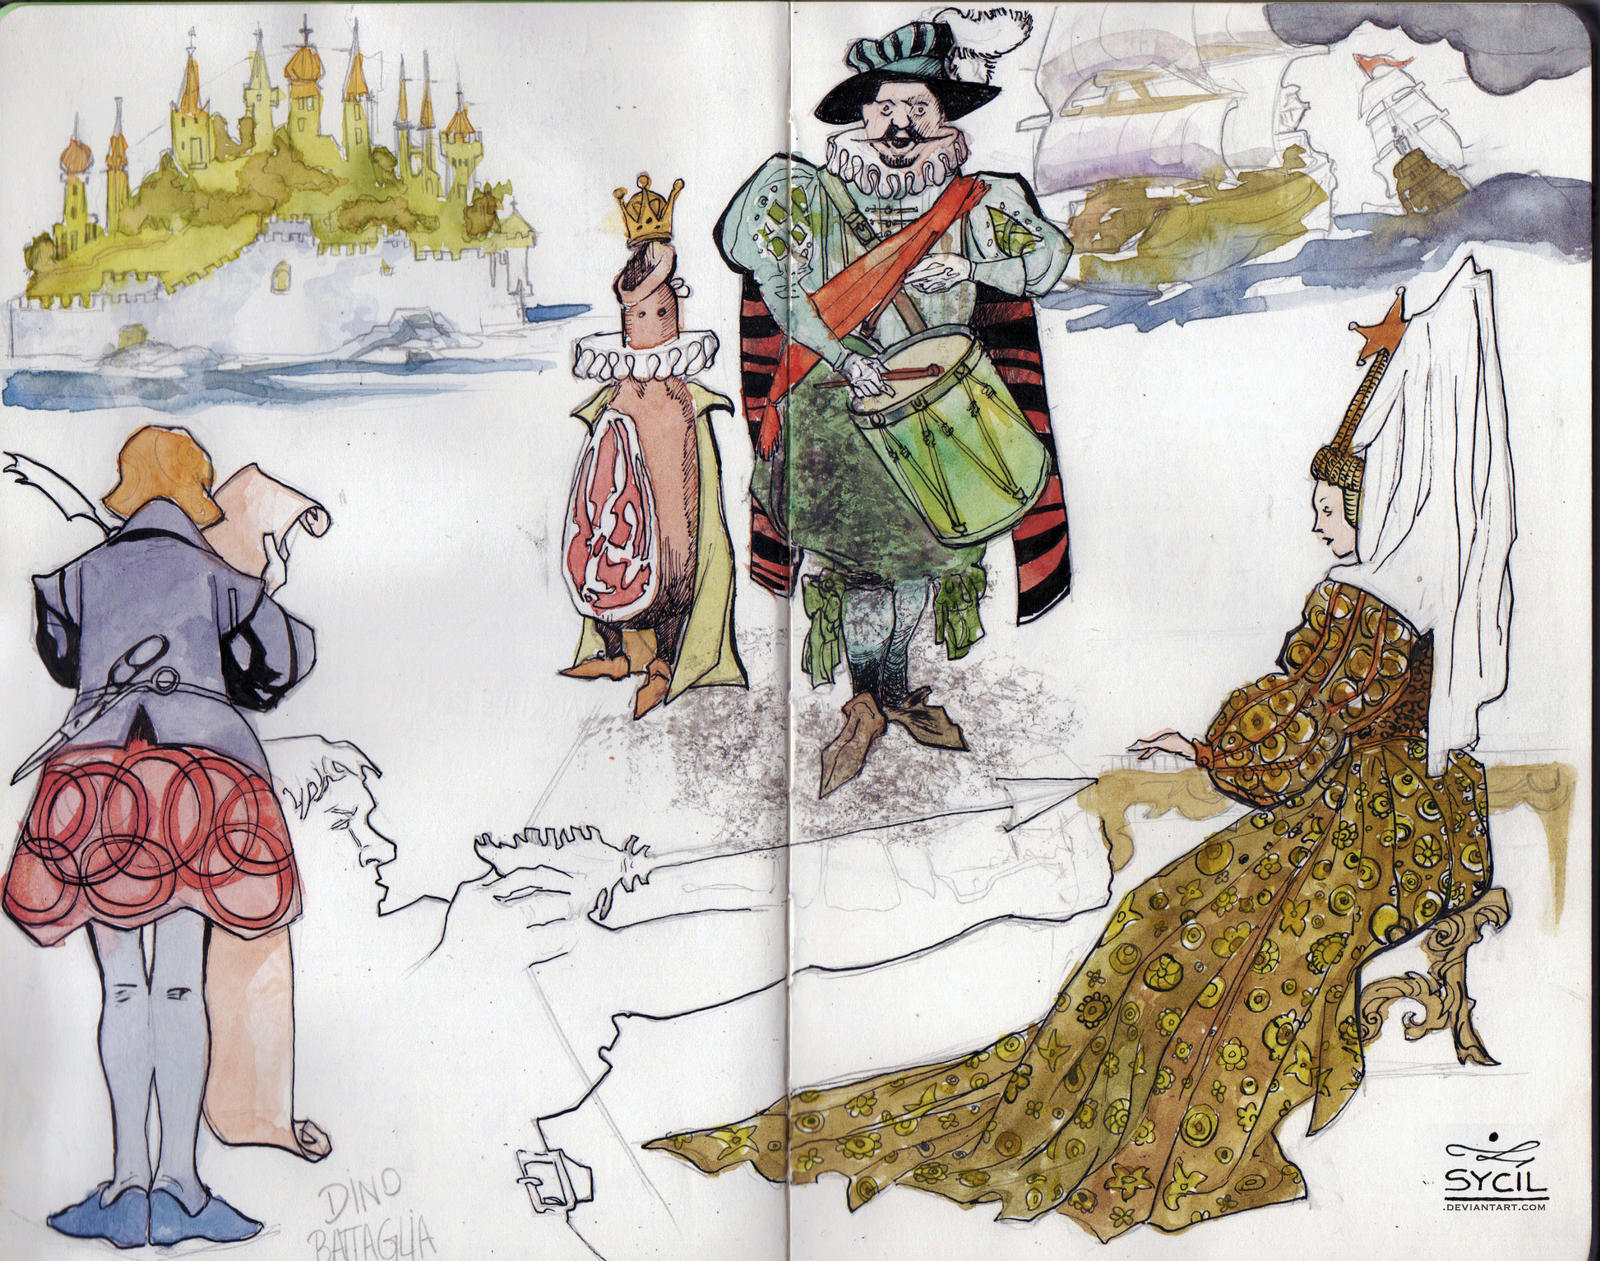 Battagllia sketches by Sycil